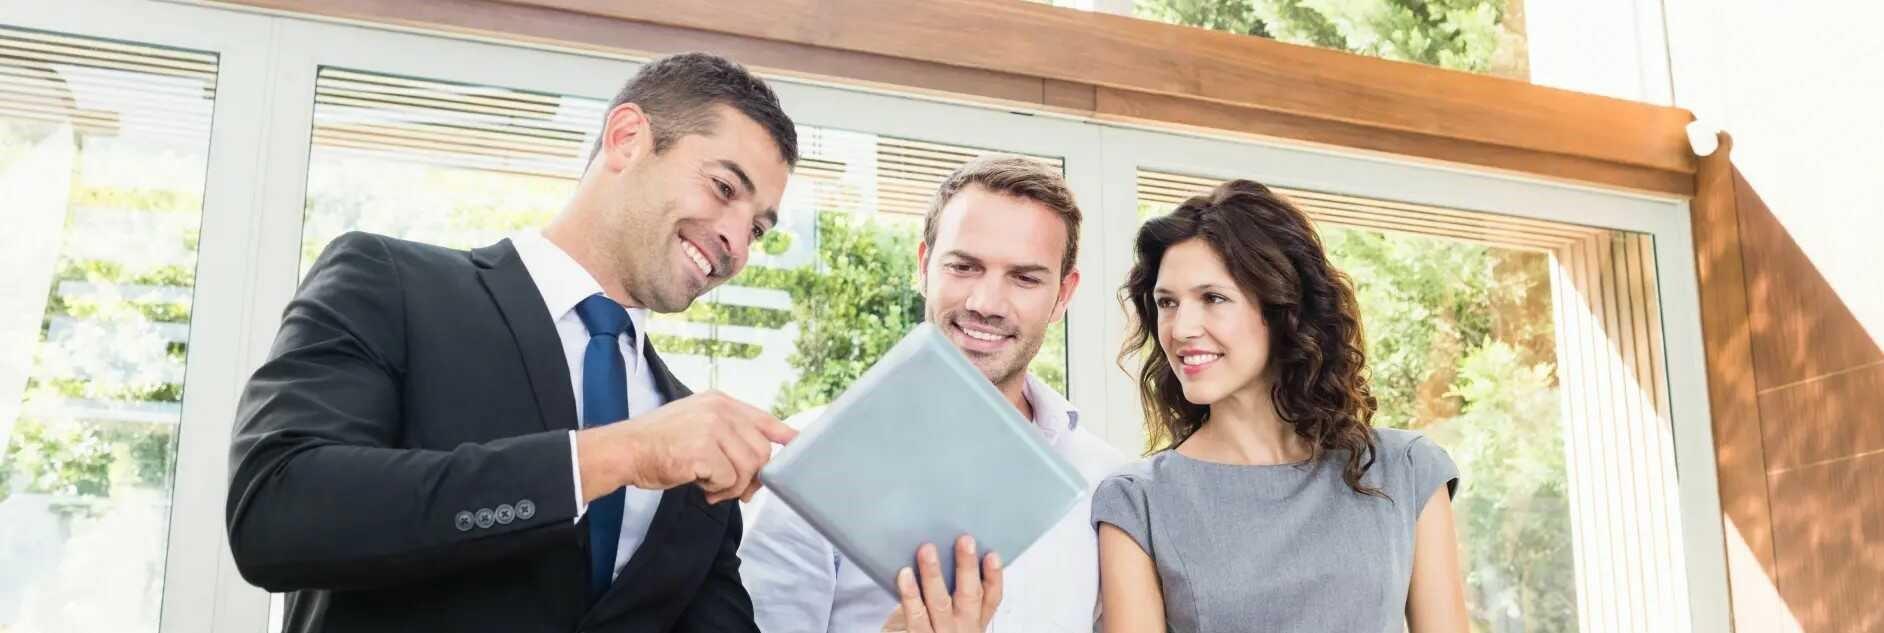 immobillien-verkaufen-hausverkauf-rosenheim-muenchen-3-menschen-protokoll-expose-adobestock_103513168